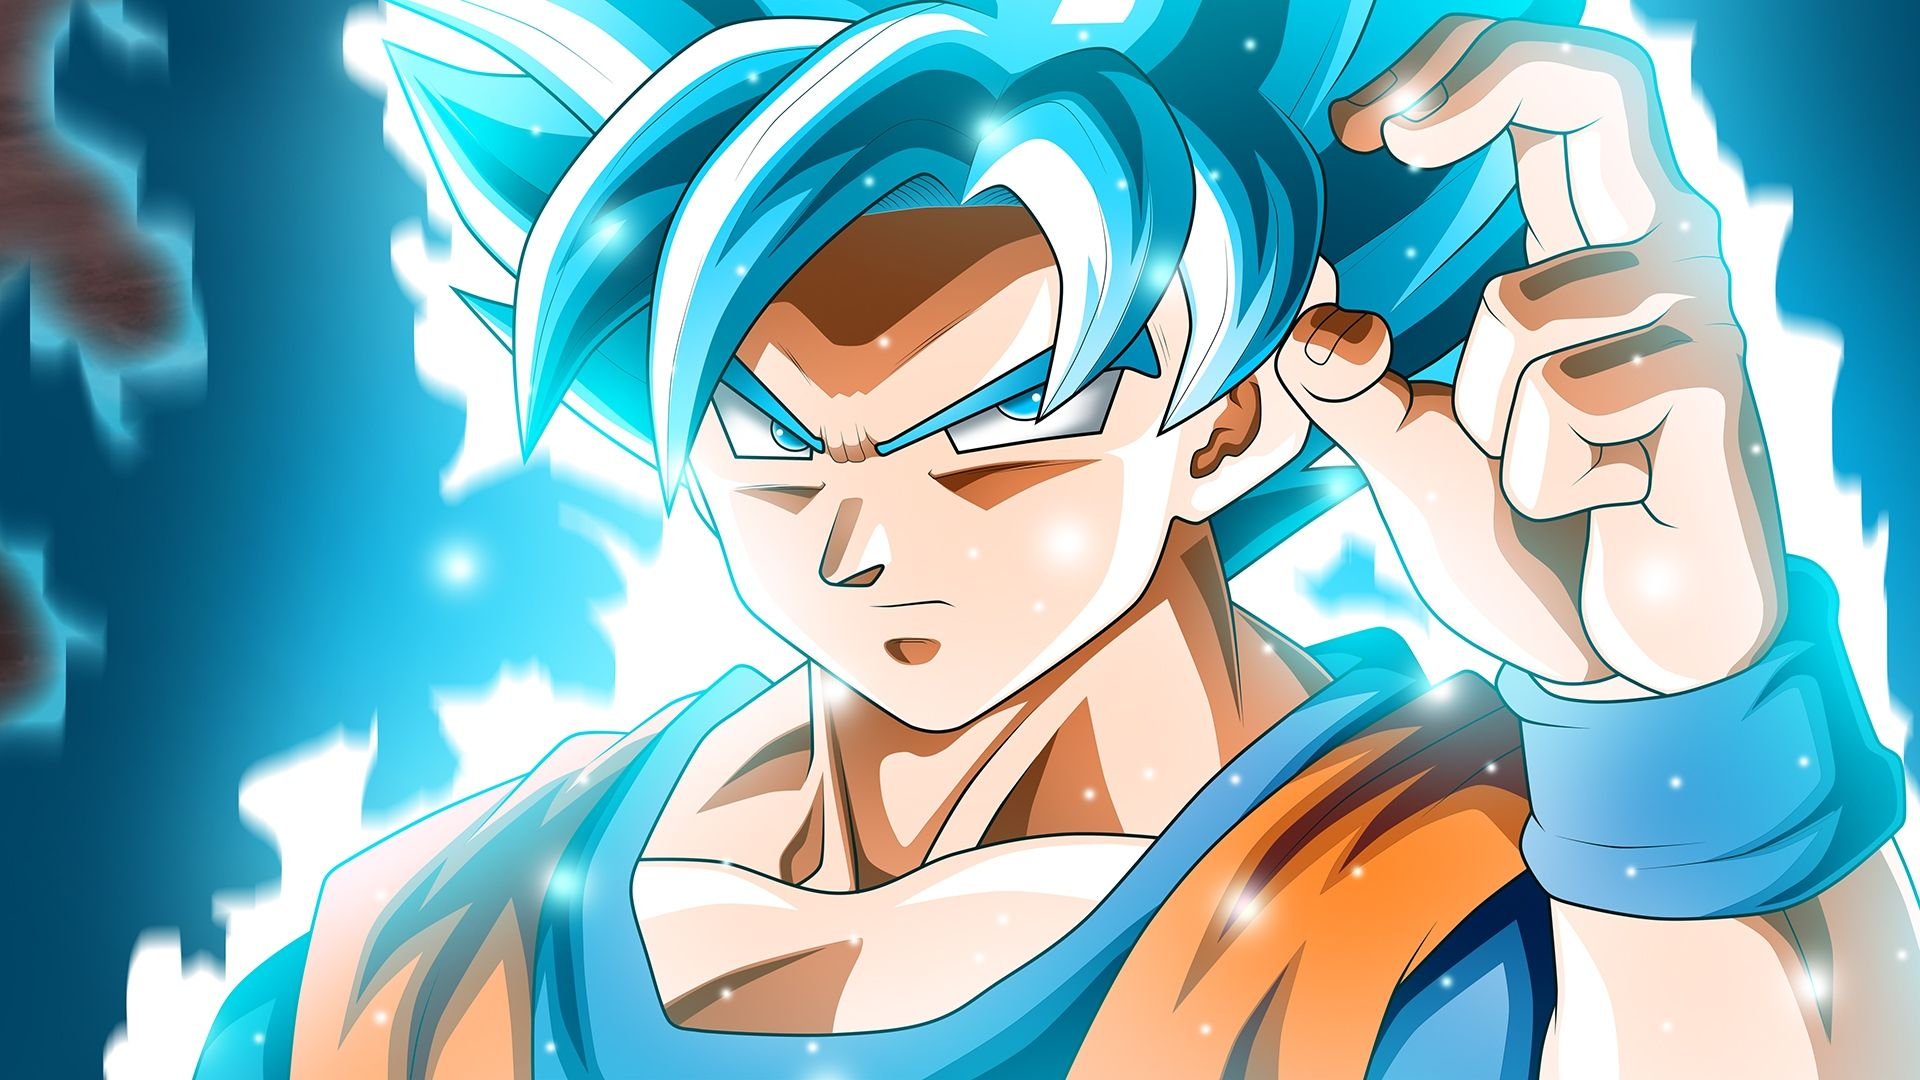 Son Goku Super Saiyan Blue Wallpaper Hd